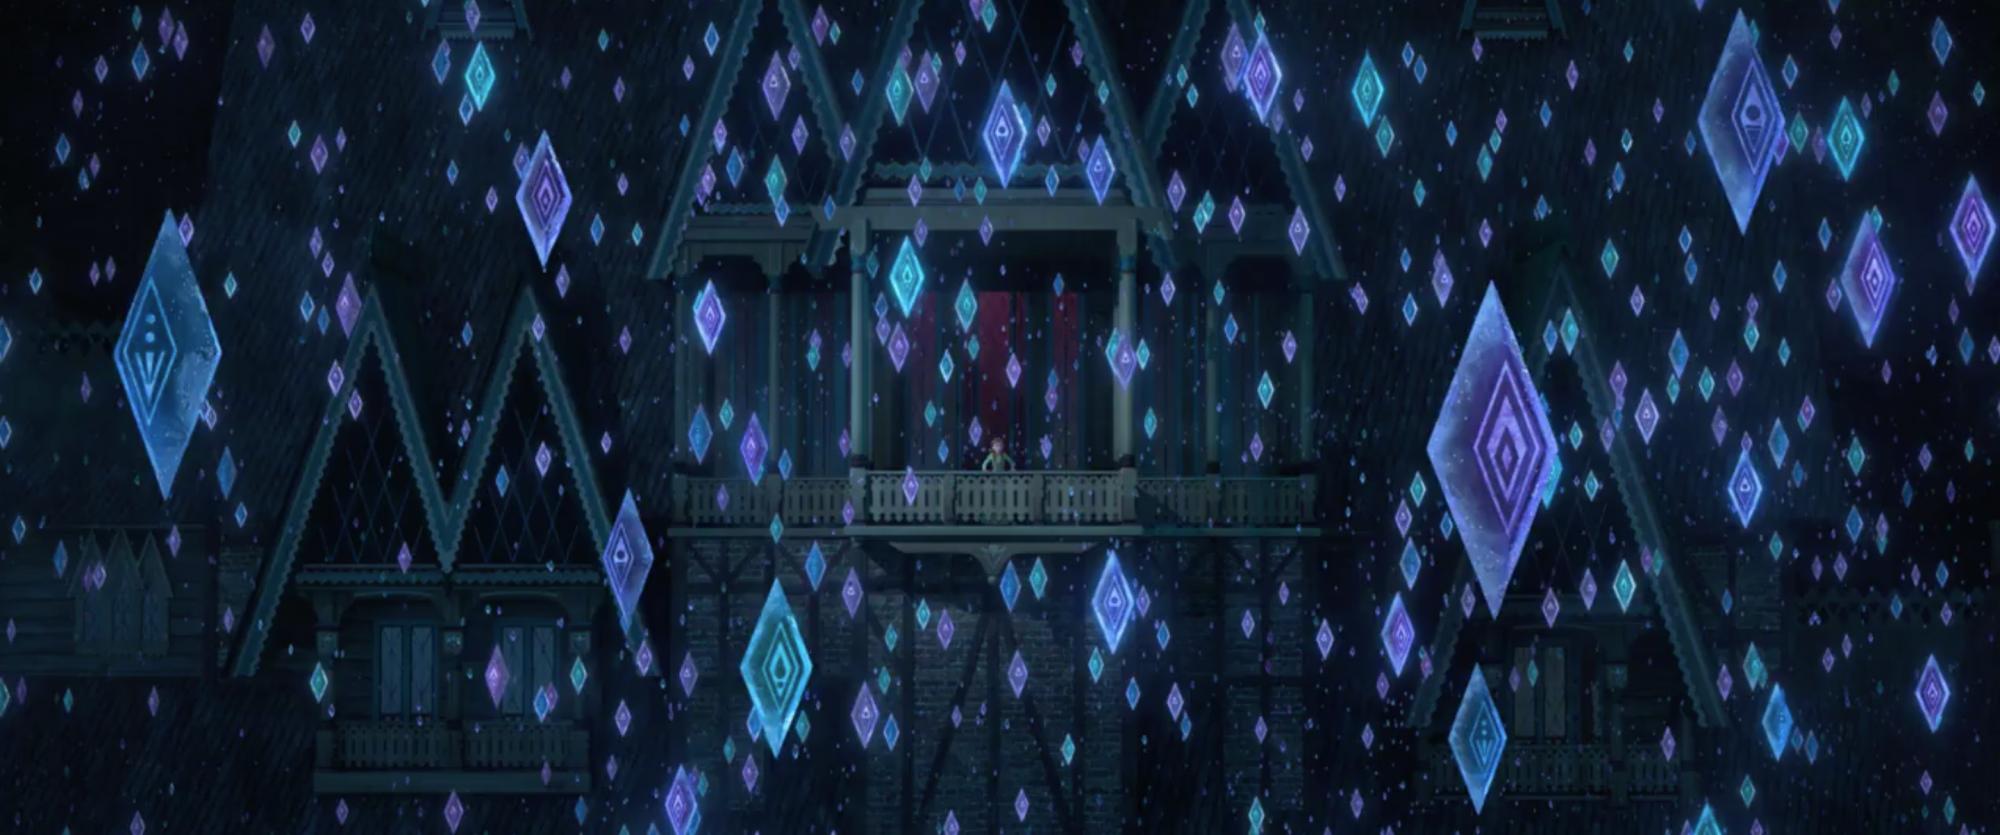 frozen-symbols